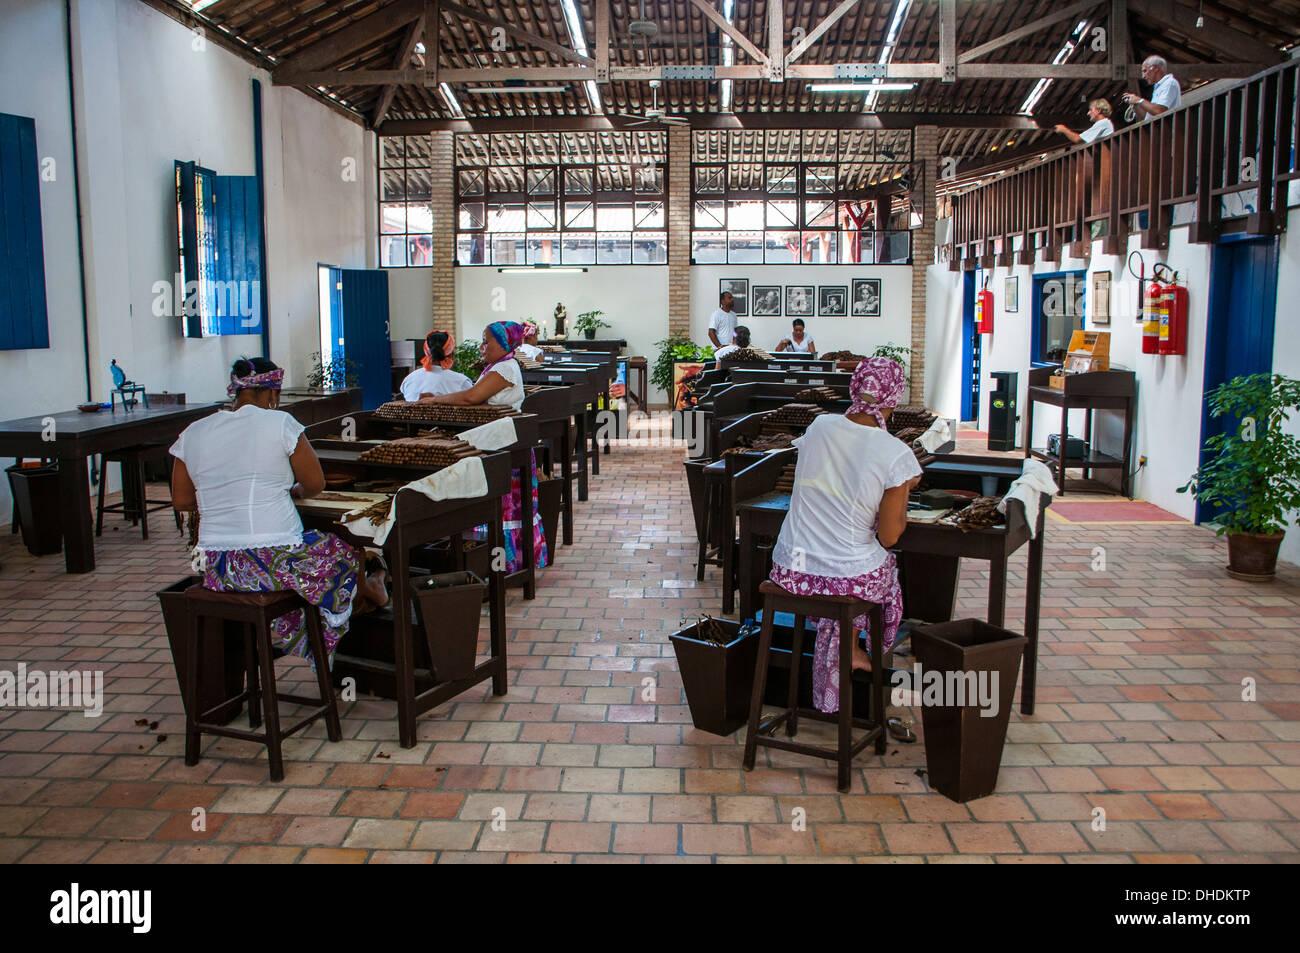 Women rolling cigars in the Dannemann cigar company in Cachoeira, Bahia, Brazil - Stock Image